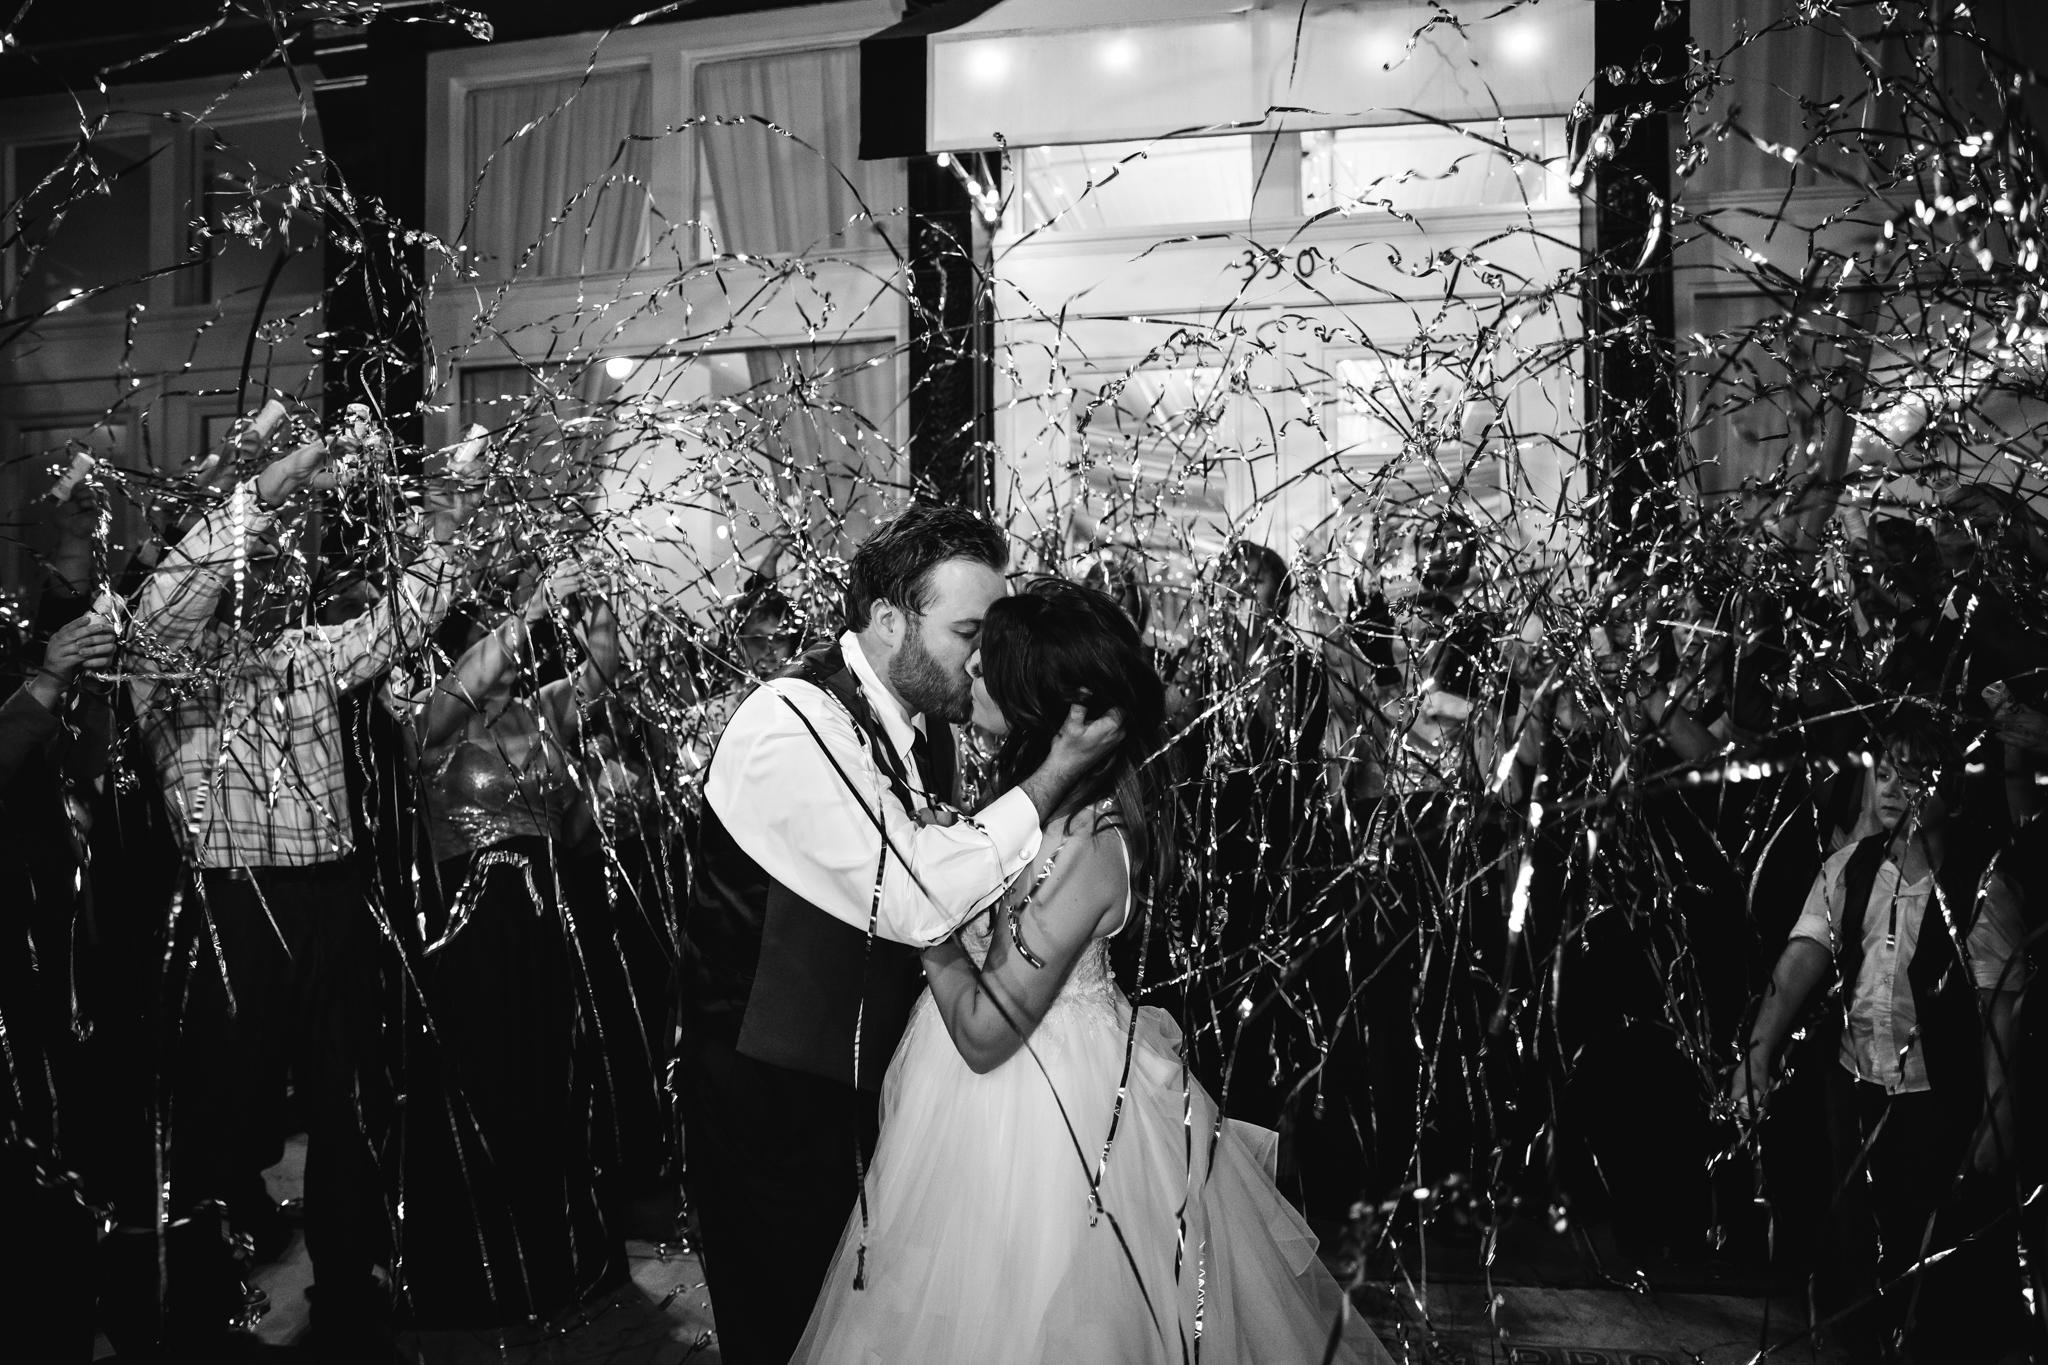 memphis-wedding-photographers-thewarmtharoundyou-ballinese-ballroom (222 of 232).jpg